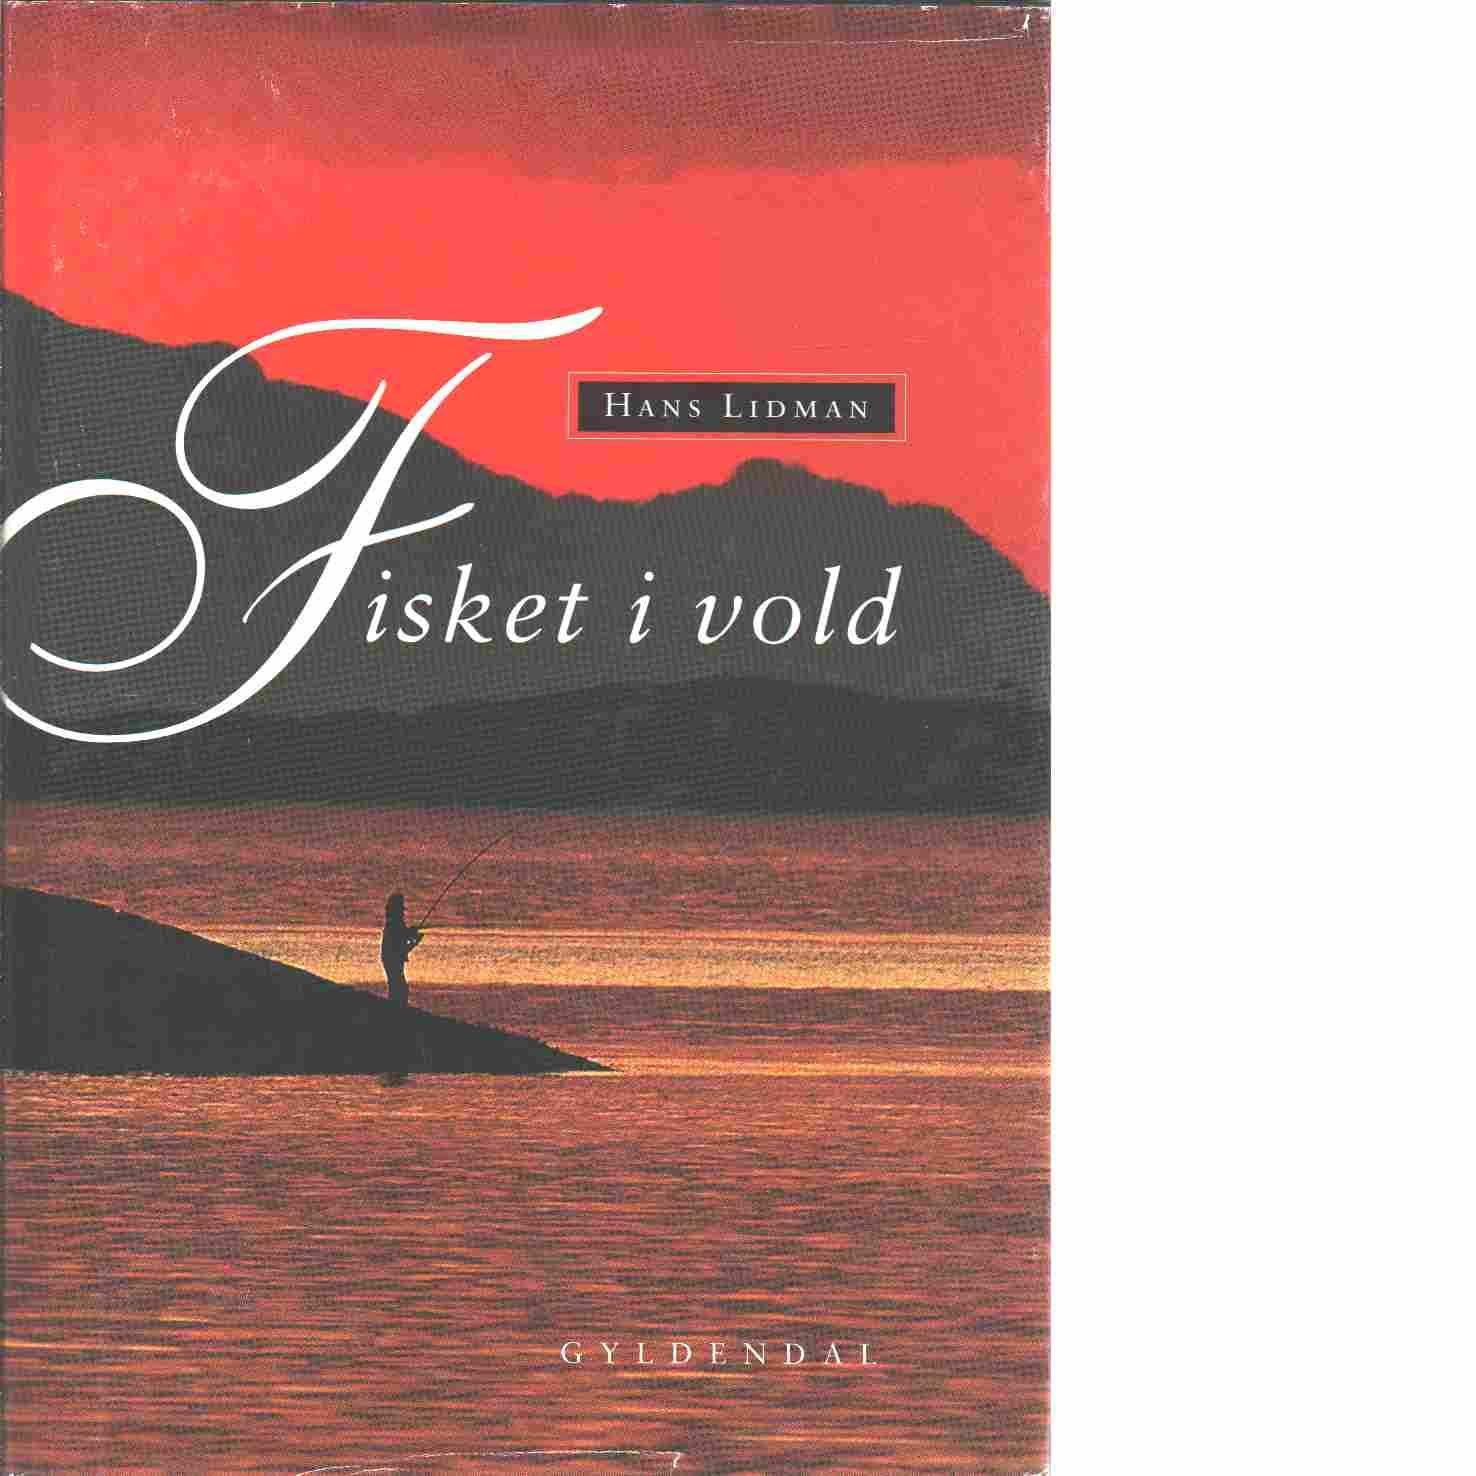 Fisket i vold - Lidman, Hans